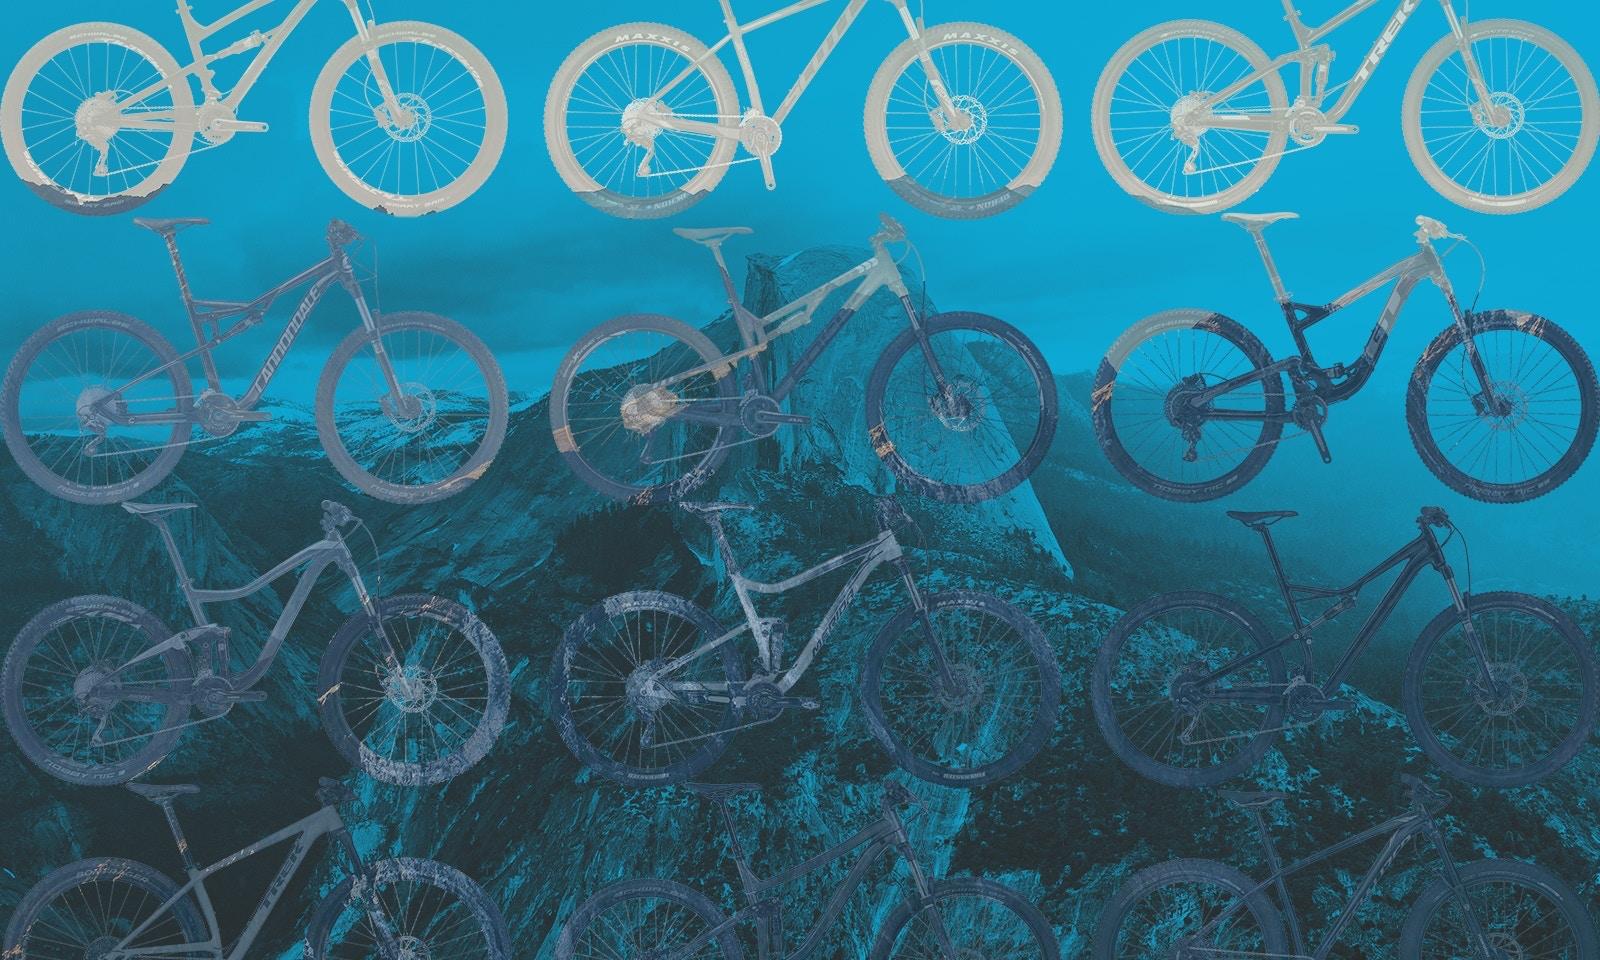 Best Trail Mountain Bikes for under $2500